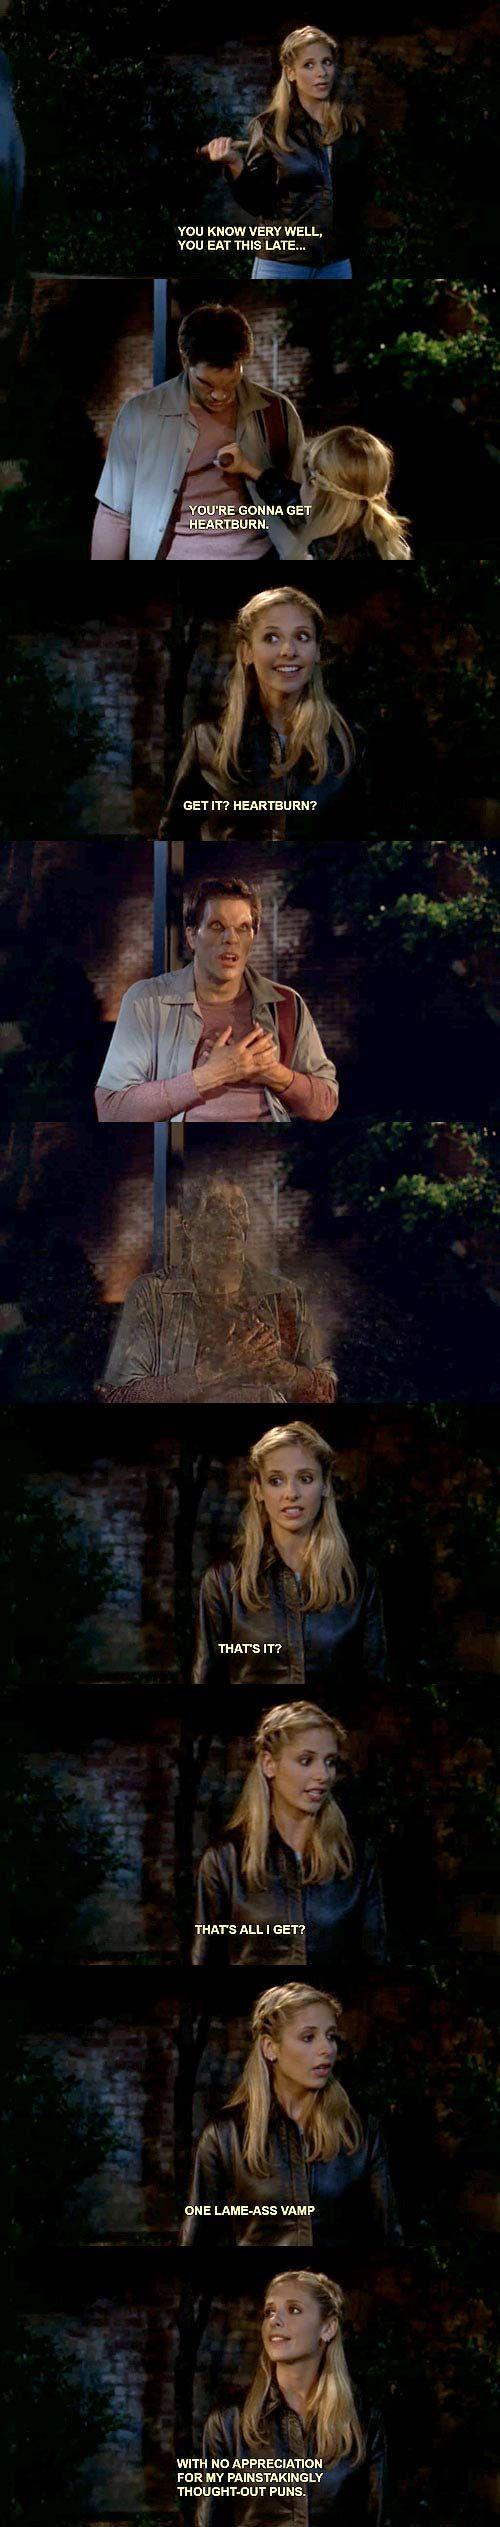 Oh Buffy...